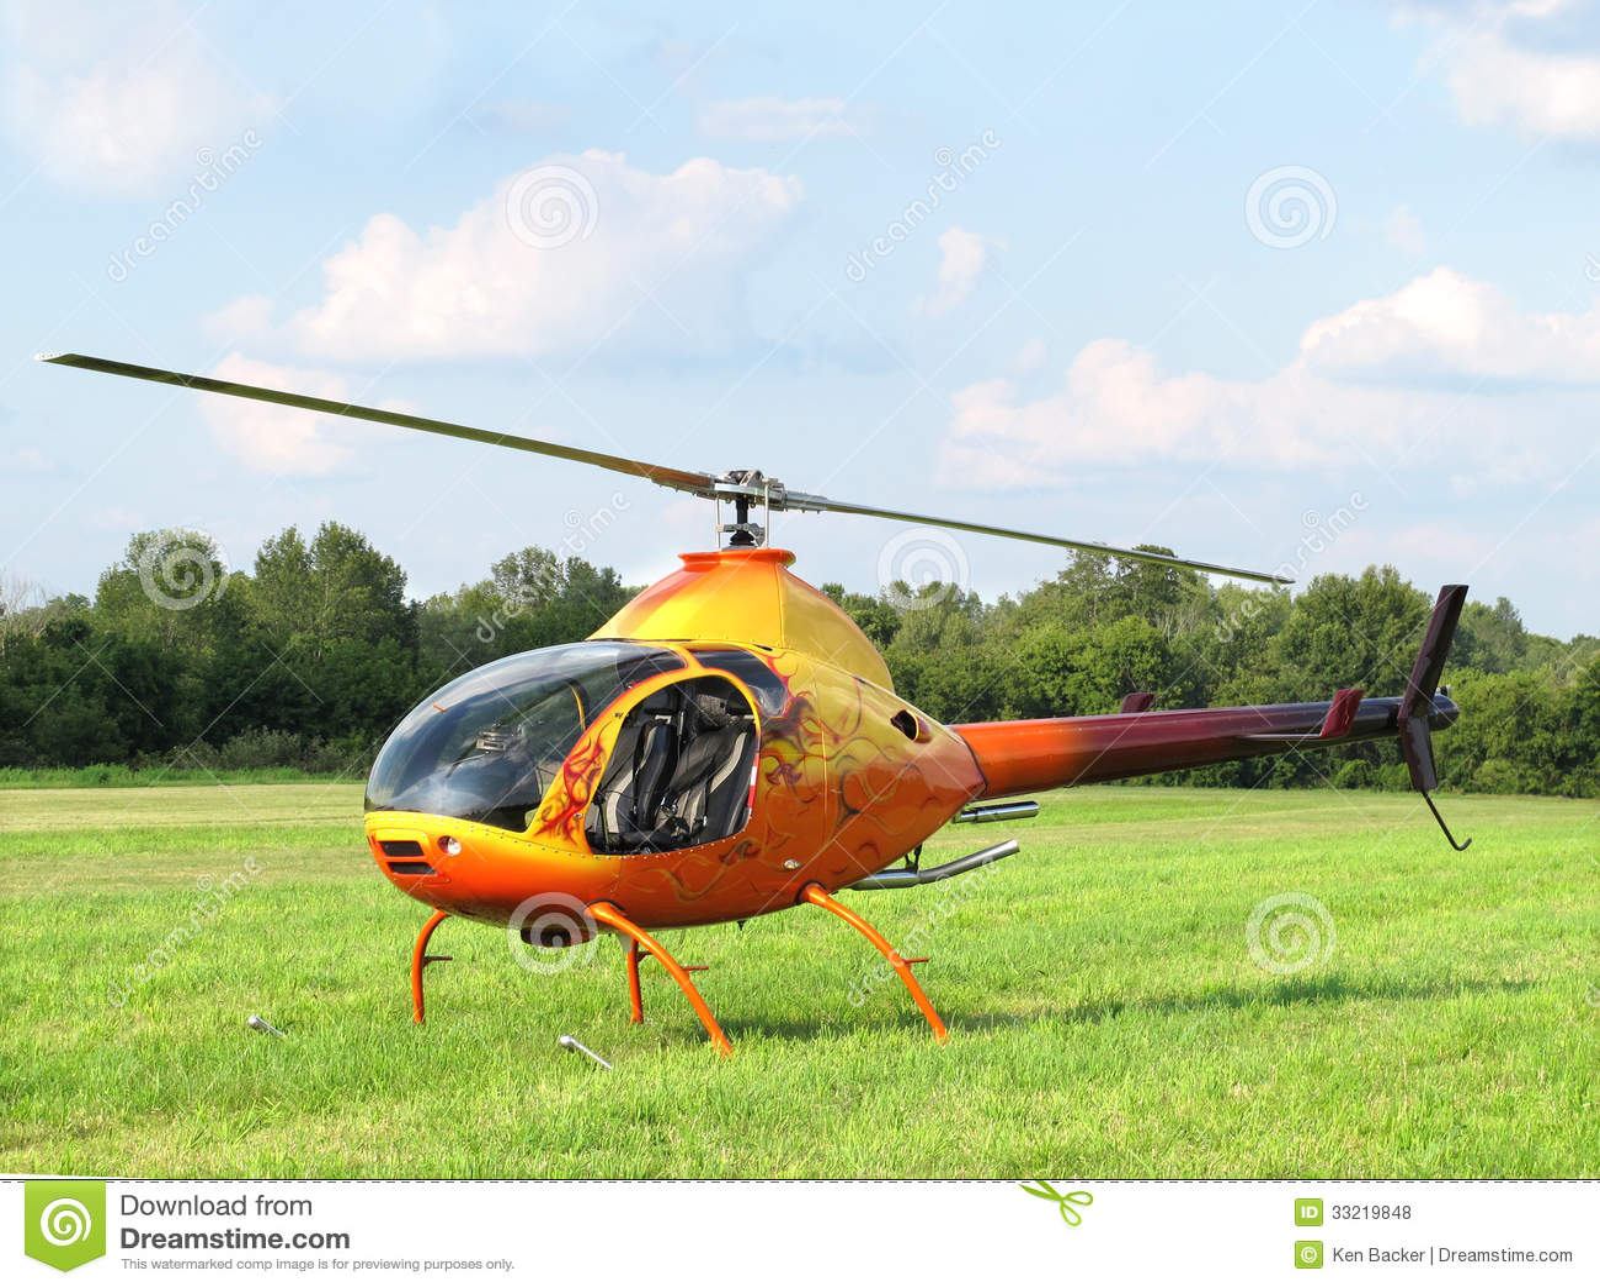 kleiner helikopter